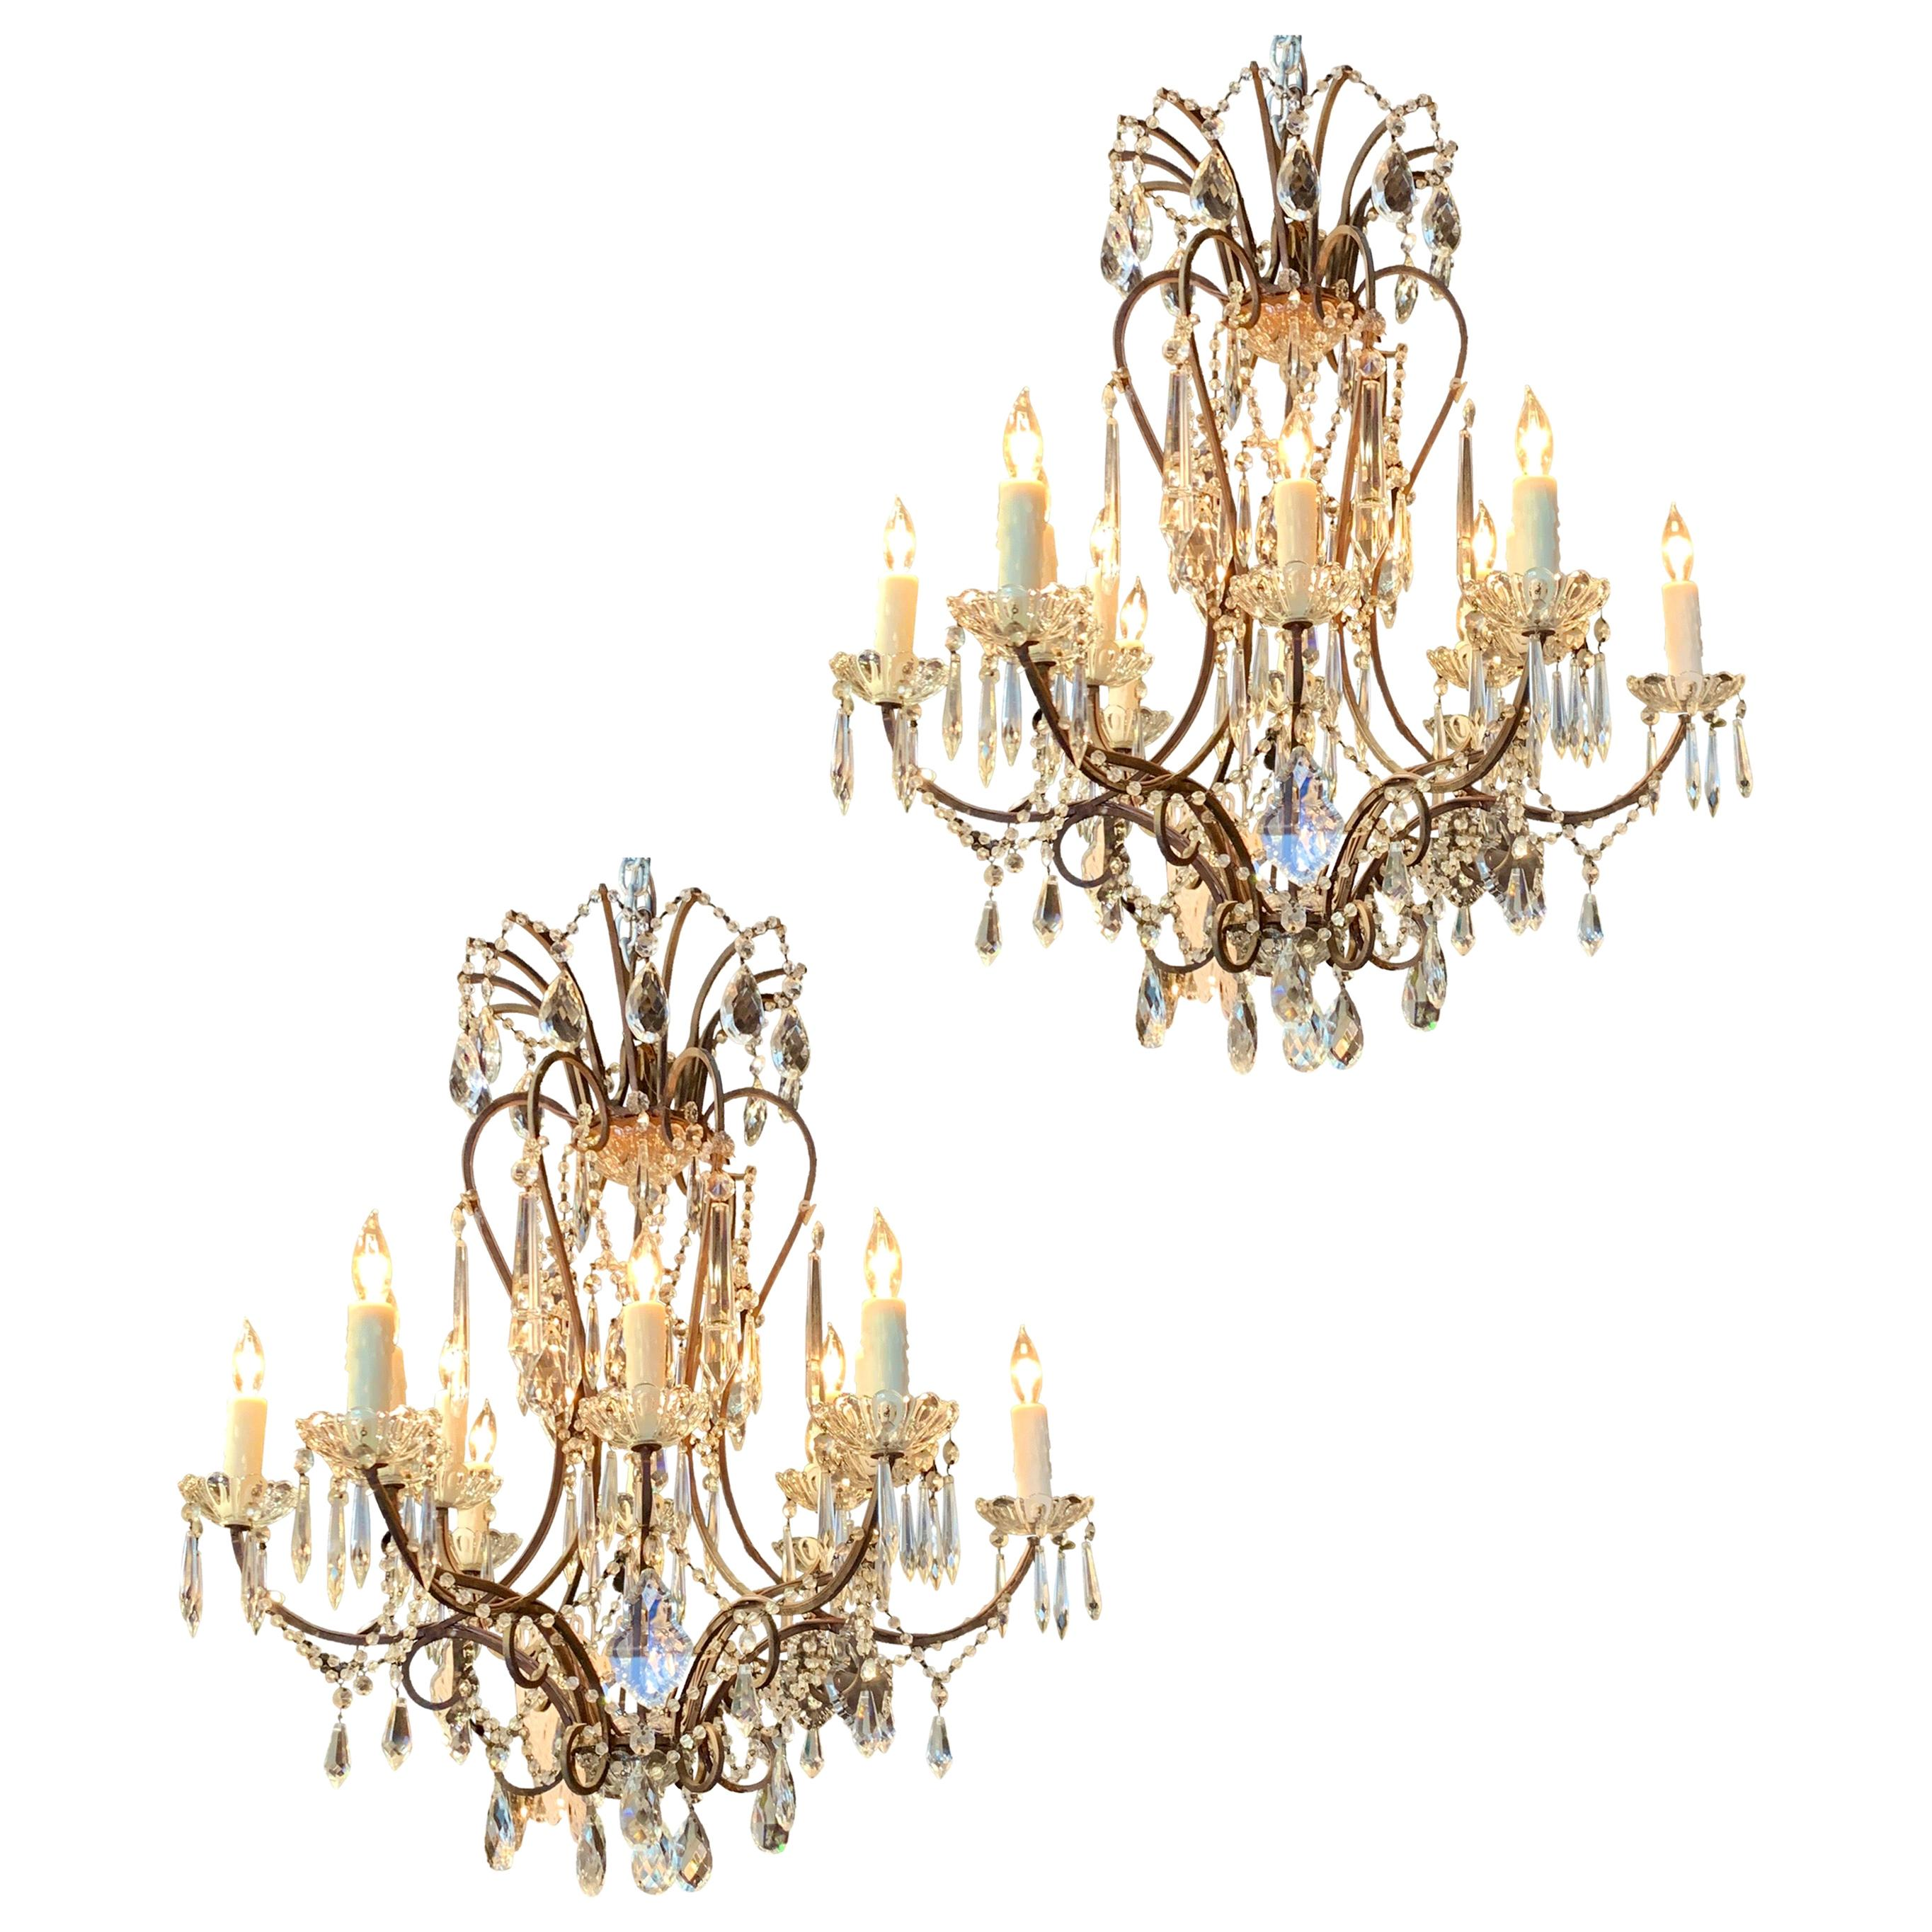 Pair of Italian 12-Light Beaded Crystal Chandeliers